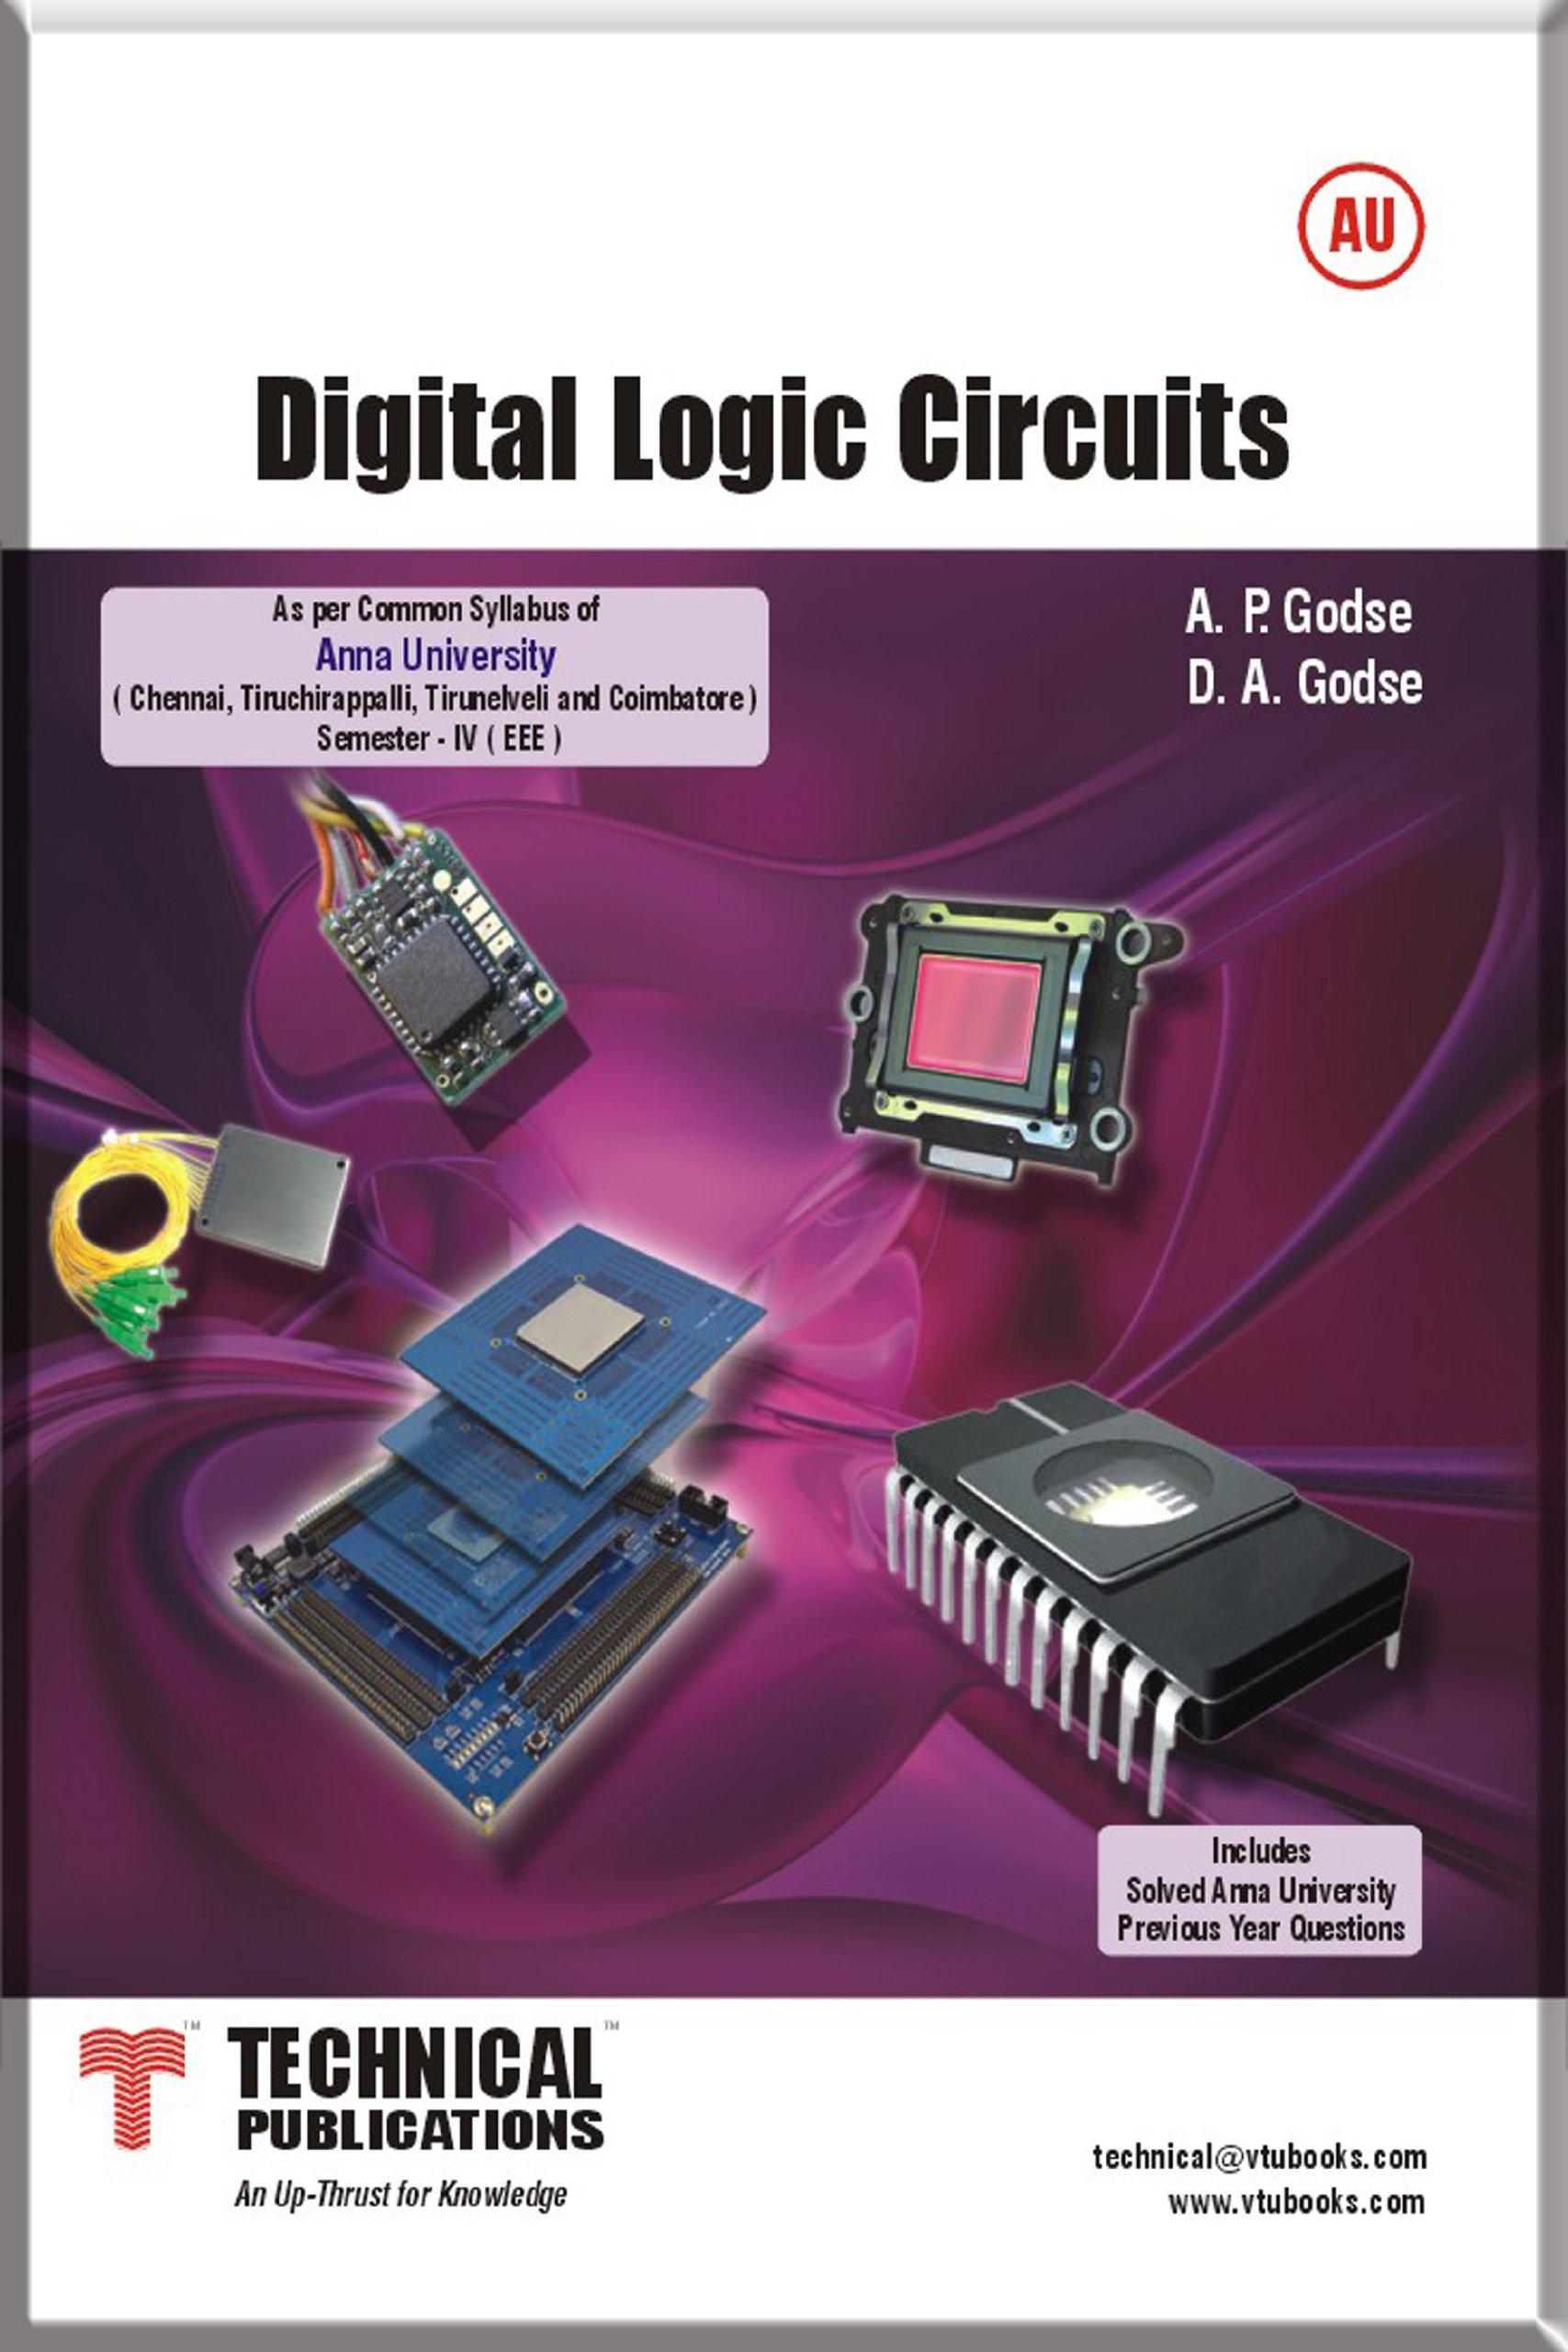 DIGITAL LOGIC DESIGN A.P GODSE EBOOK DOWNLOAD